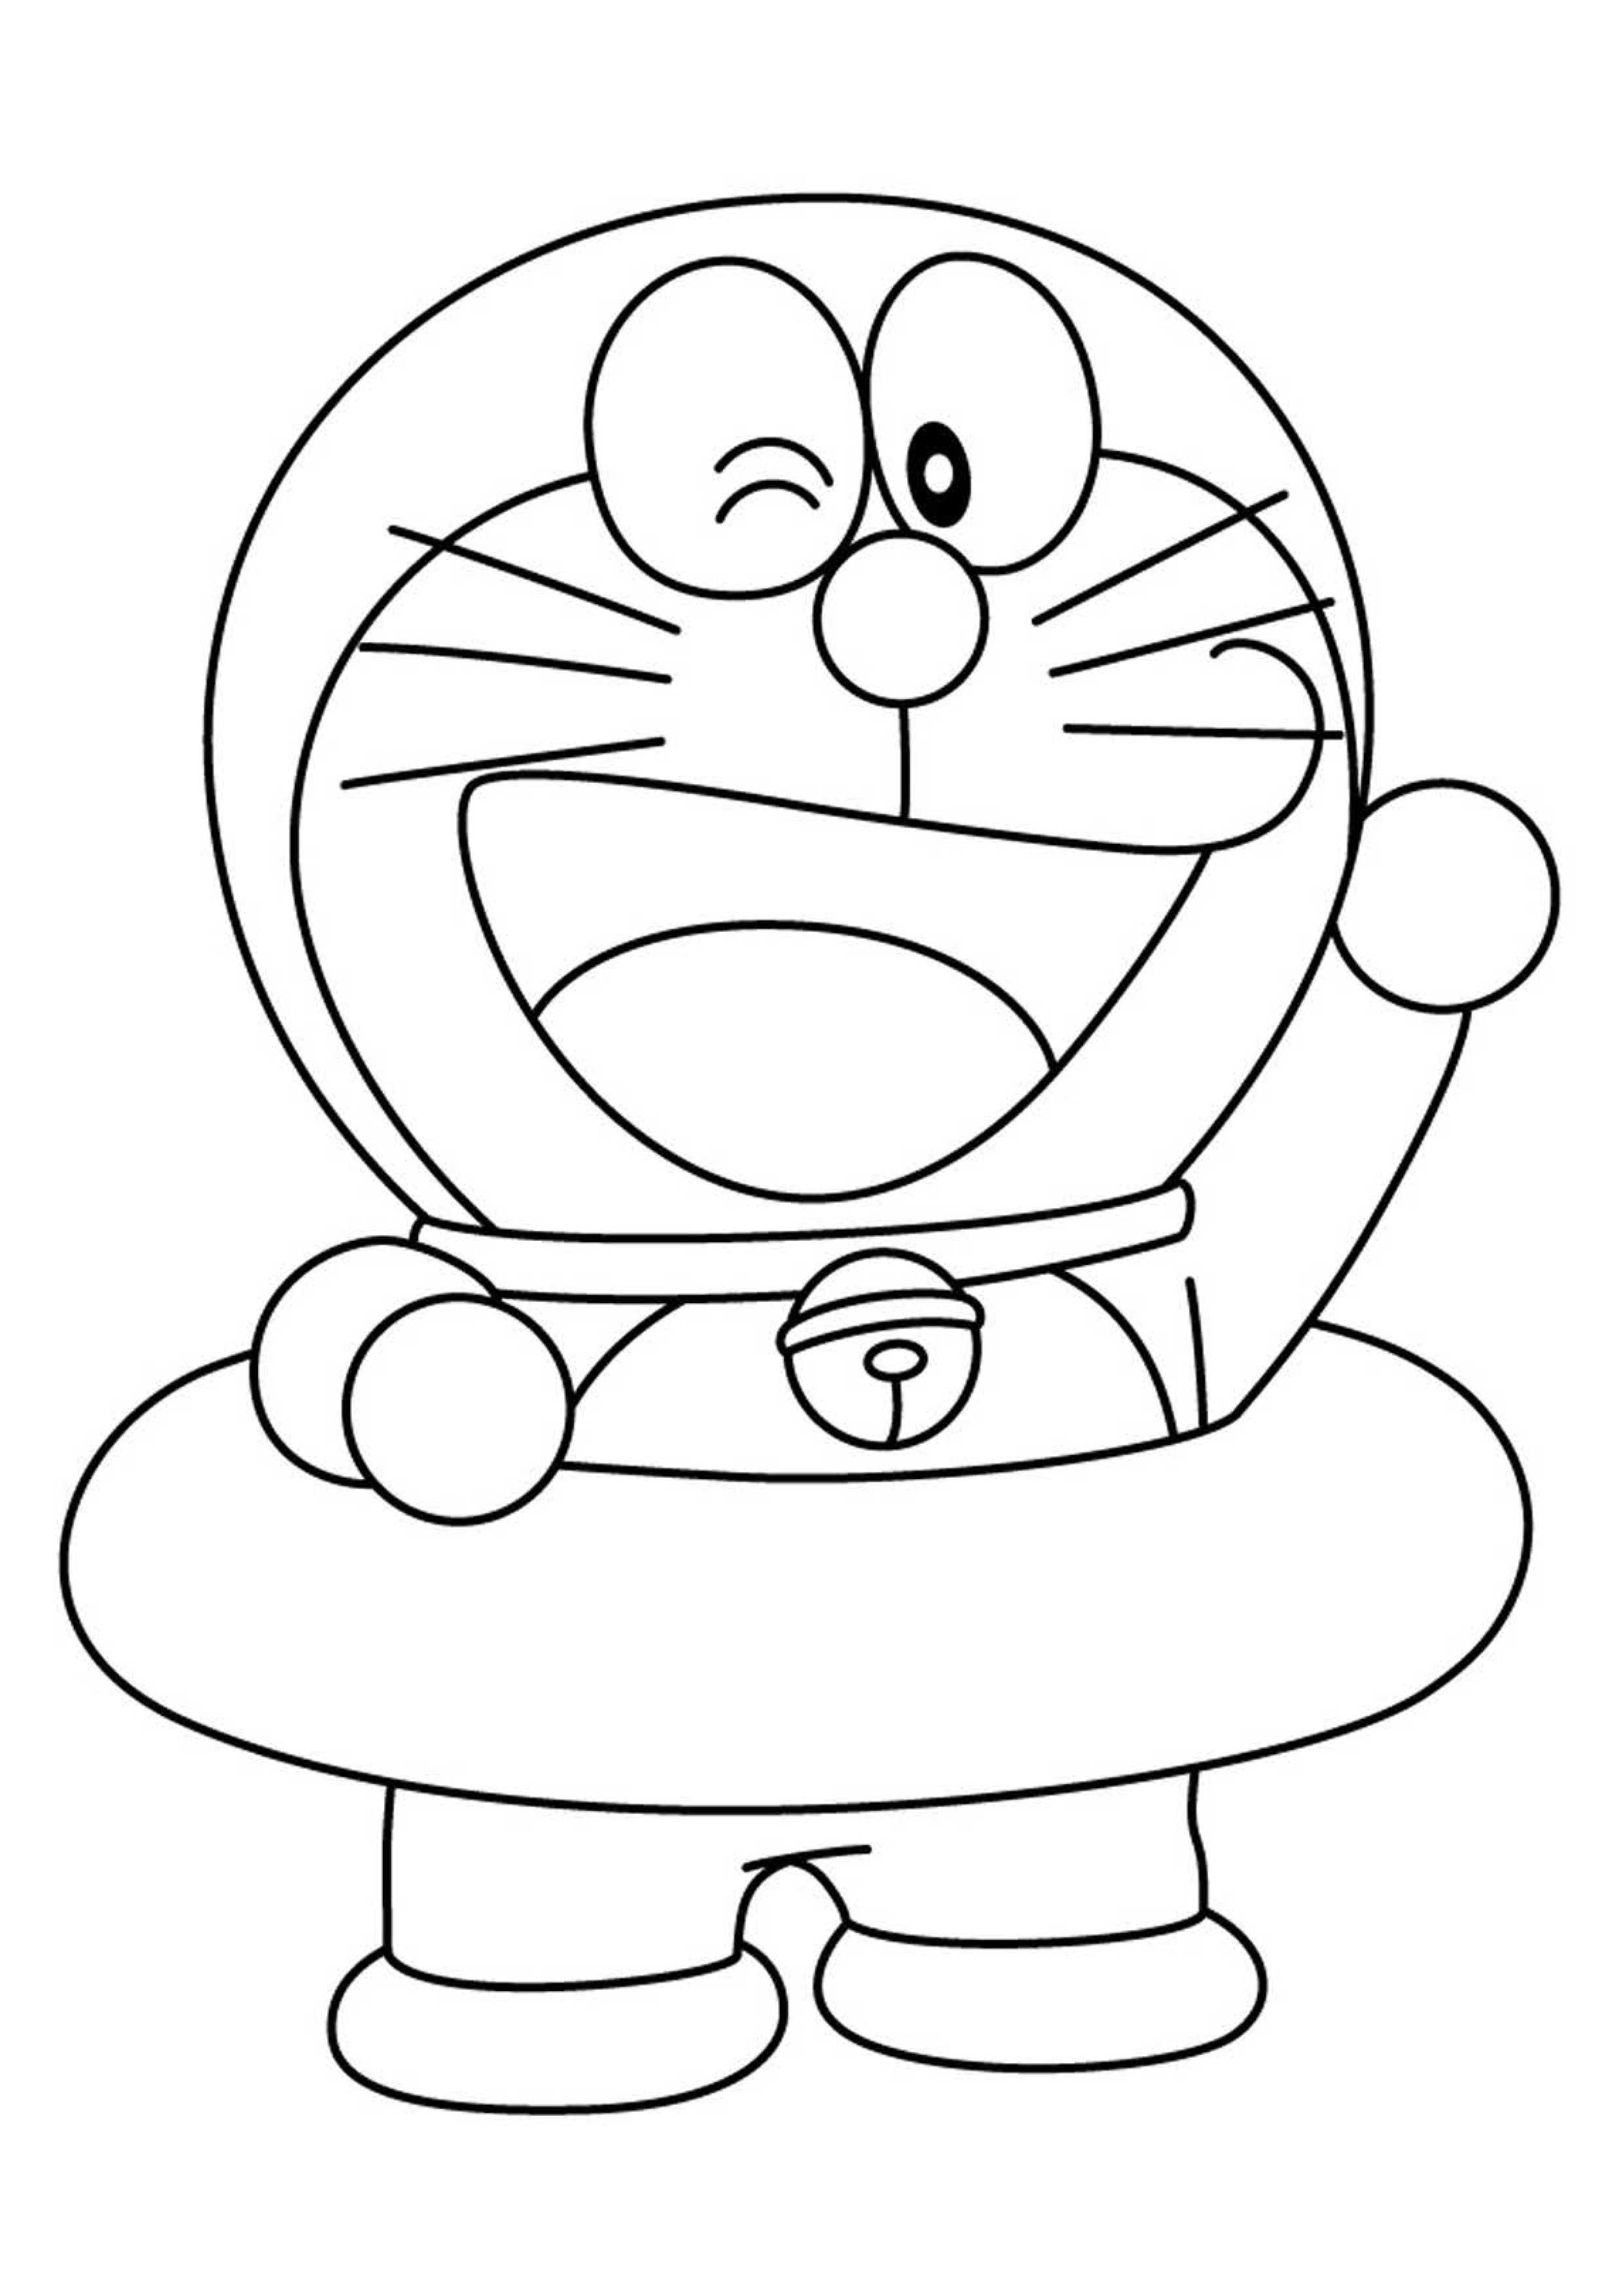 Doraemon-03